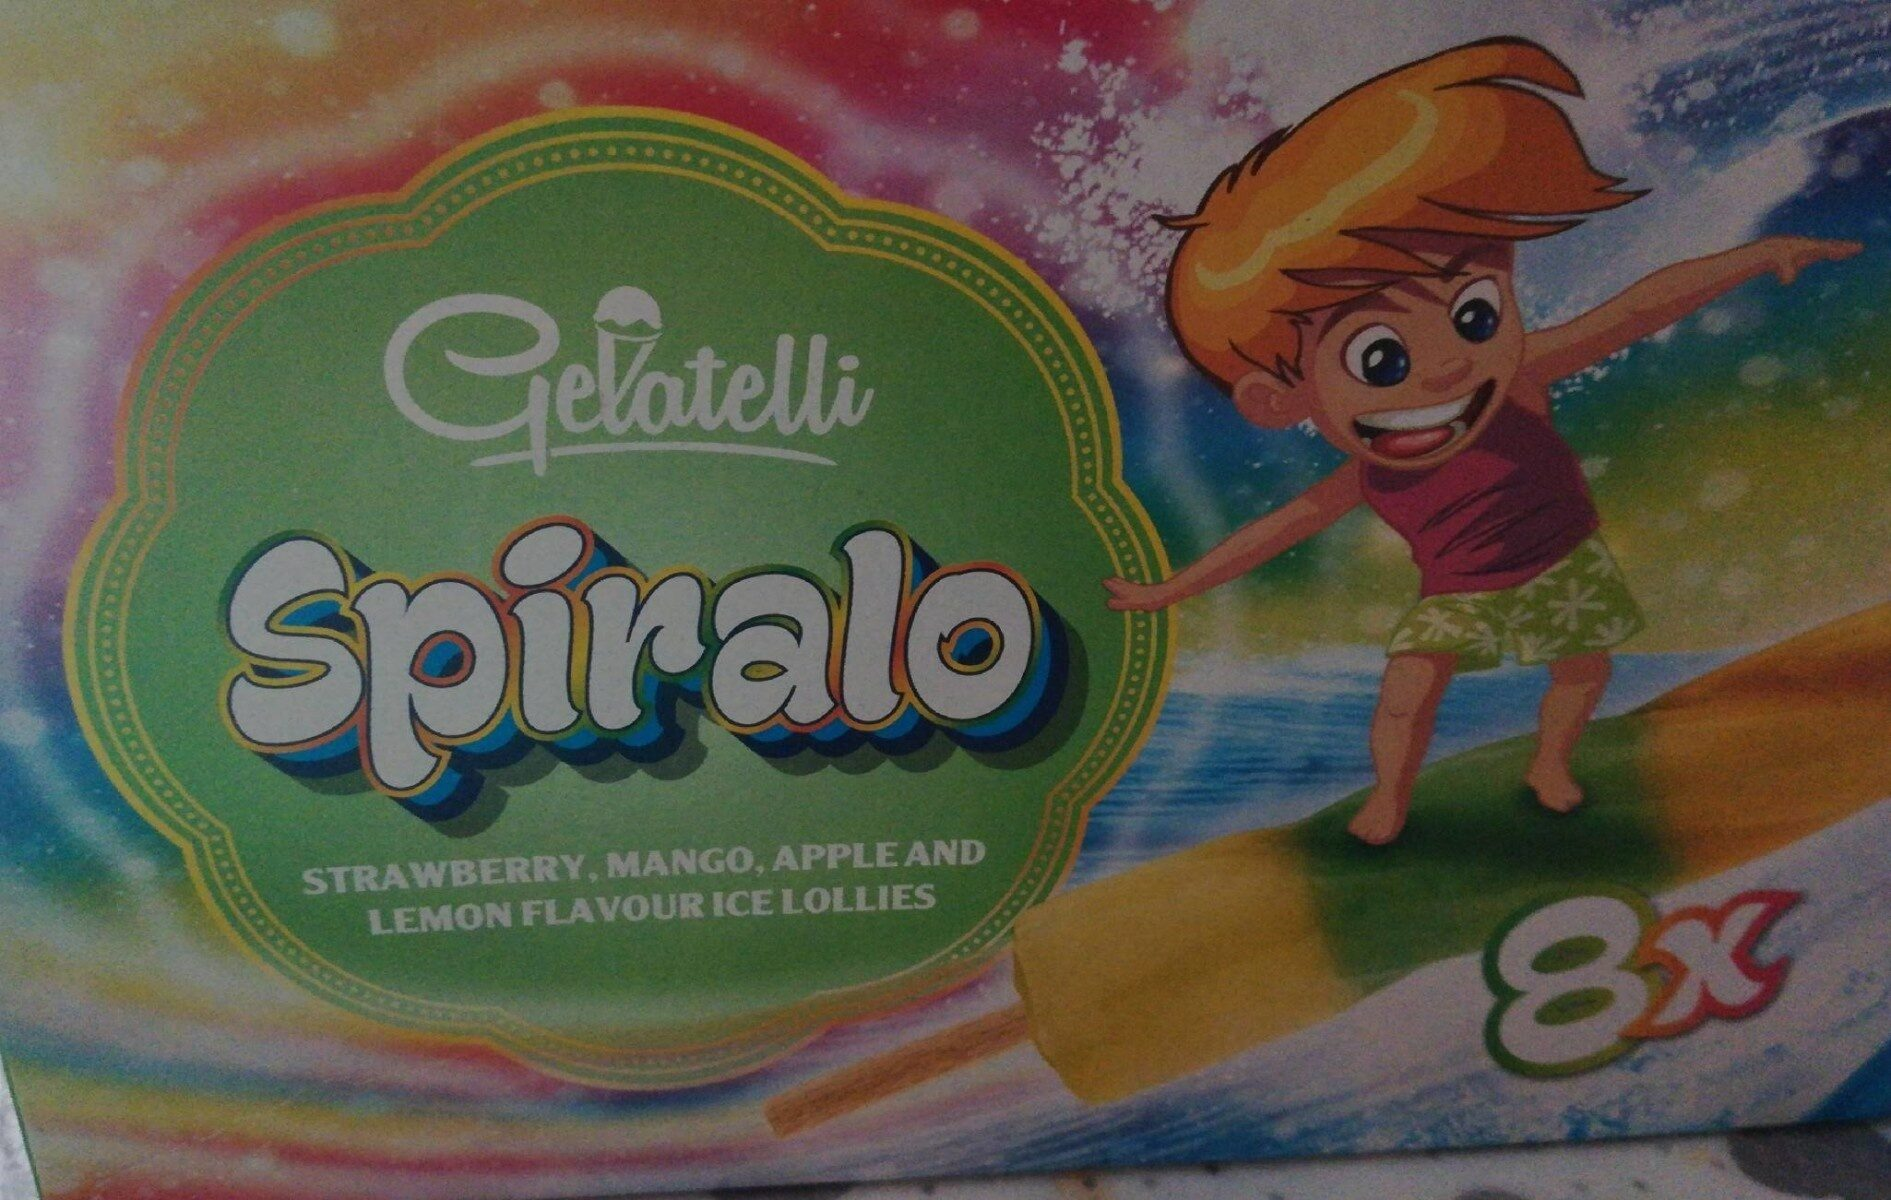 Gelatelli Spirallo - Product